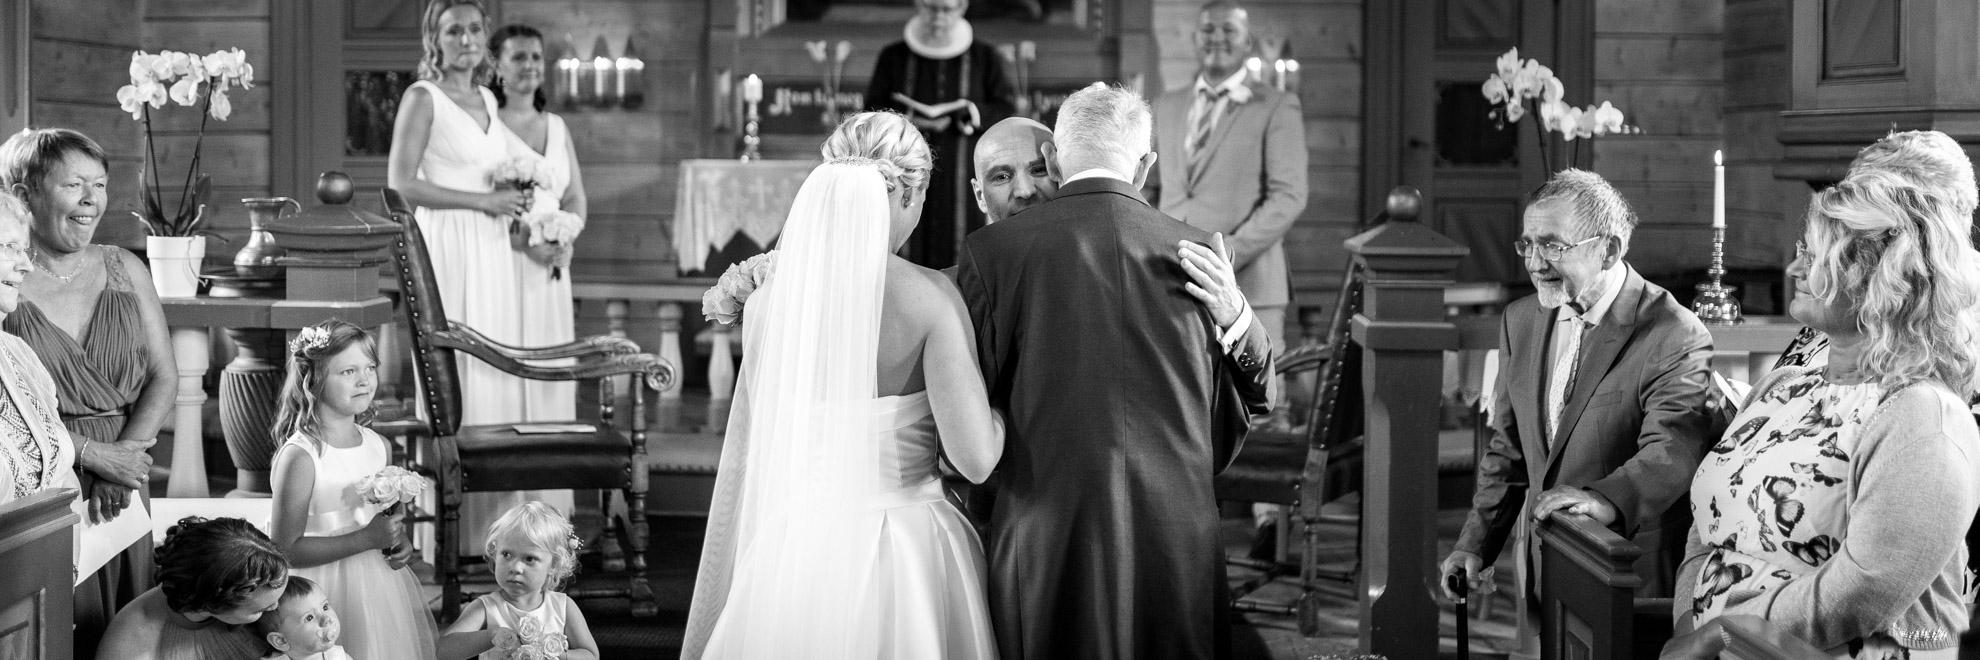 Wedding Ceremony Panorama